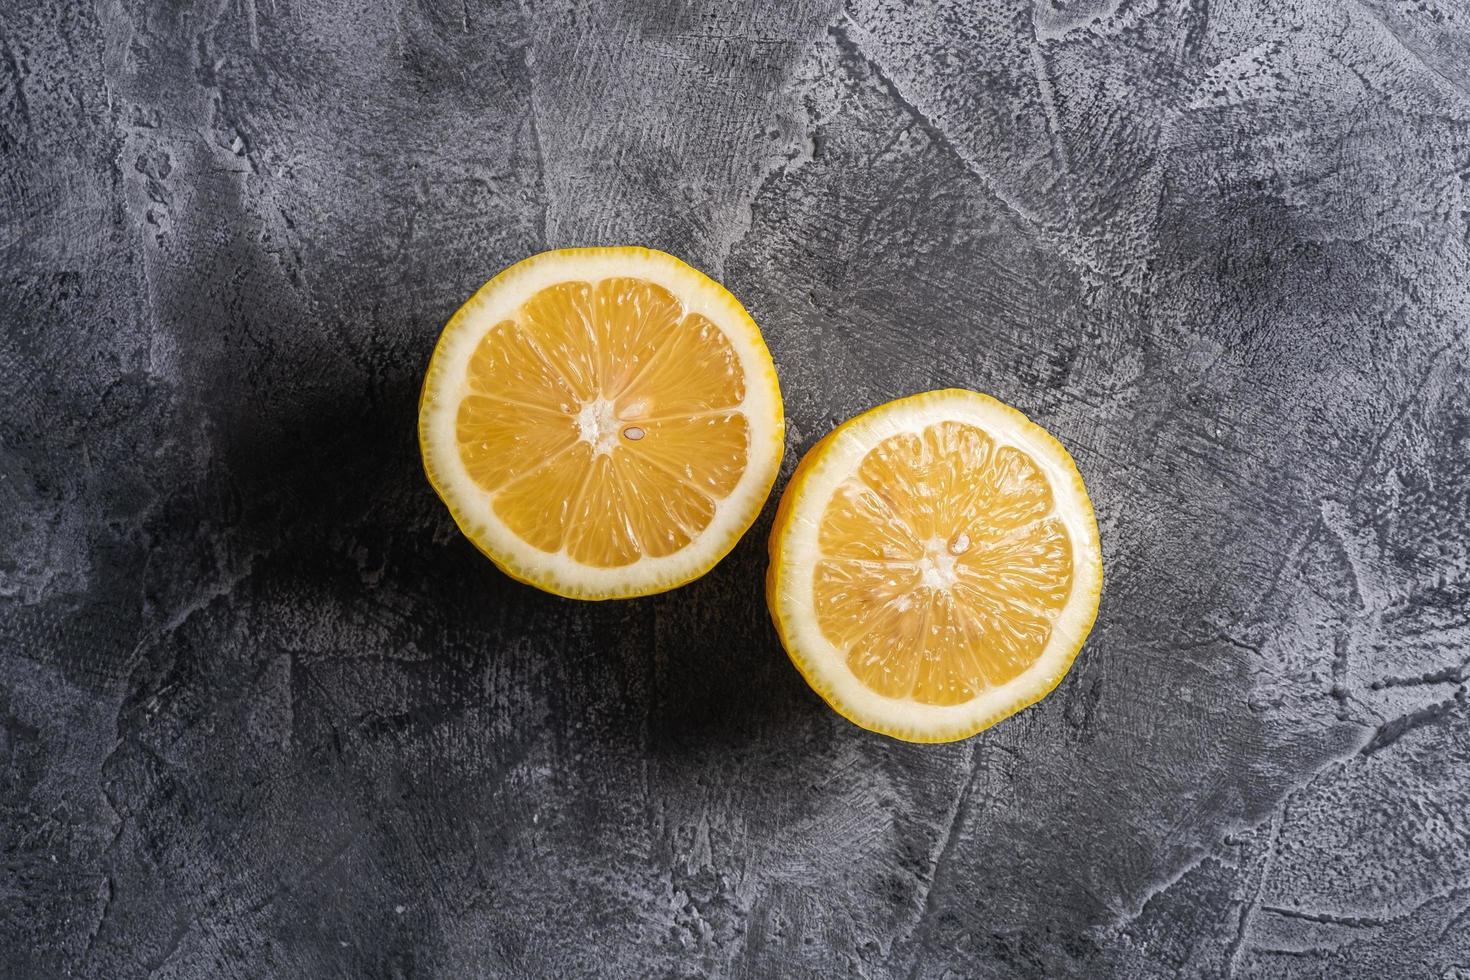 A lemon cut in half on gray concrete background photo